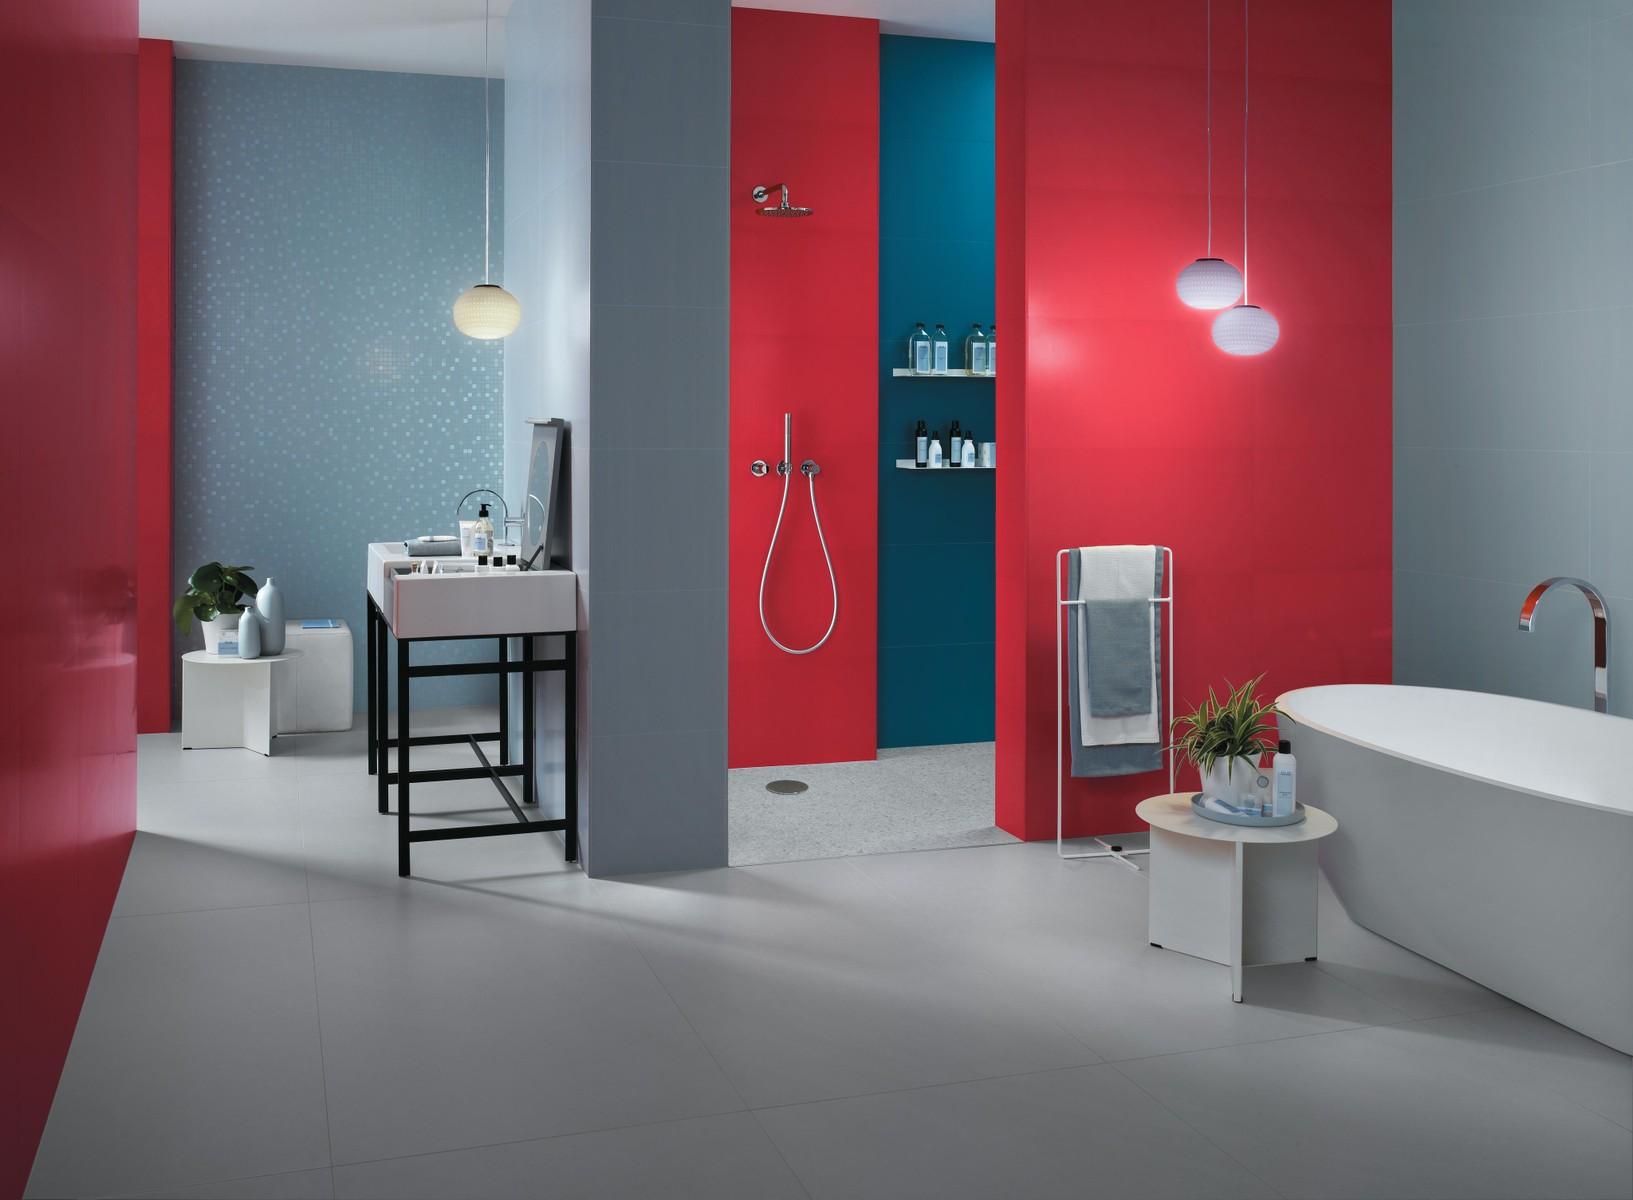 Sky 40x80, Red 40x80, Blue 40x80, Sky Mosaico Q 30,5x30,5, White Matte 75x150, Marvel Gems Terrazzo White Matte 60x60